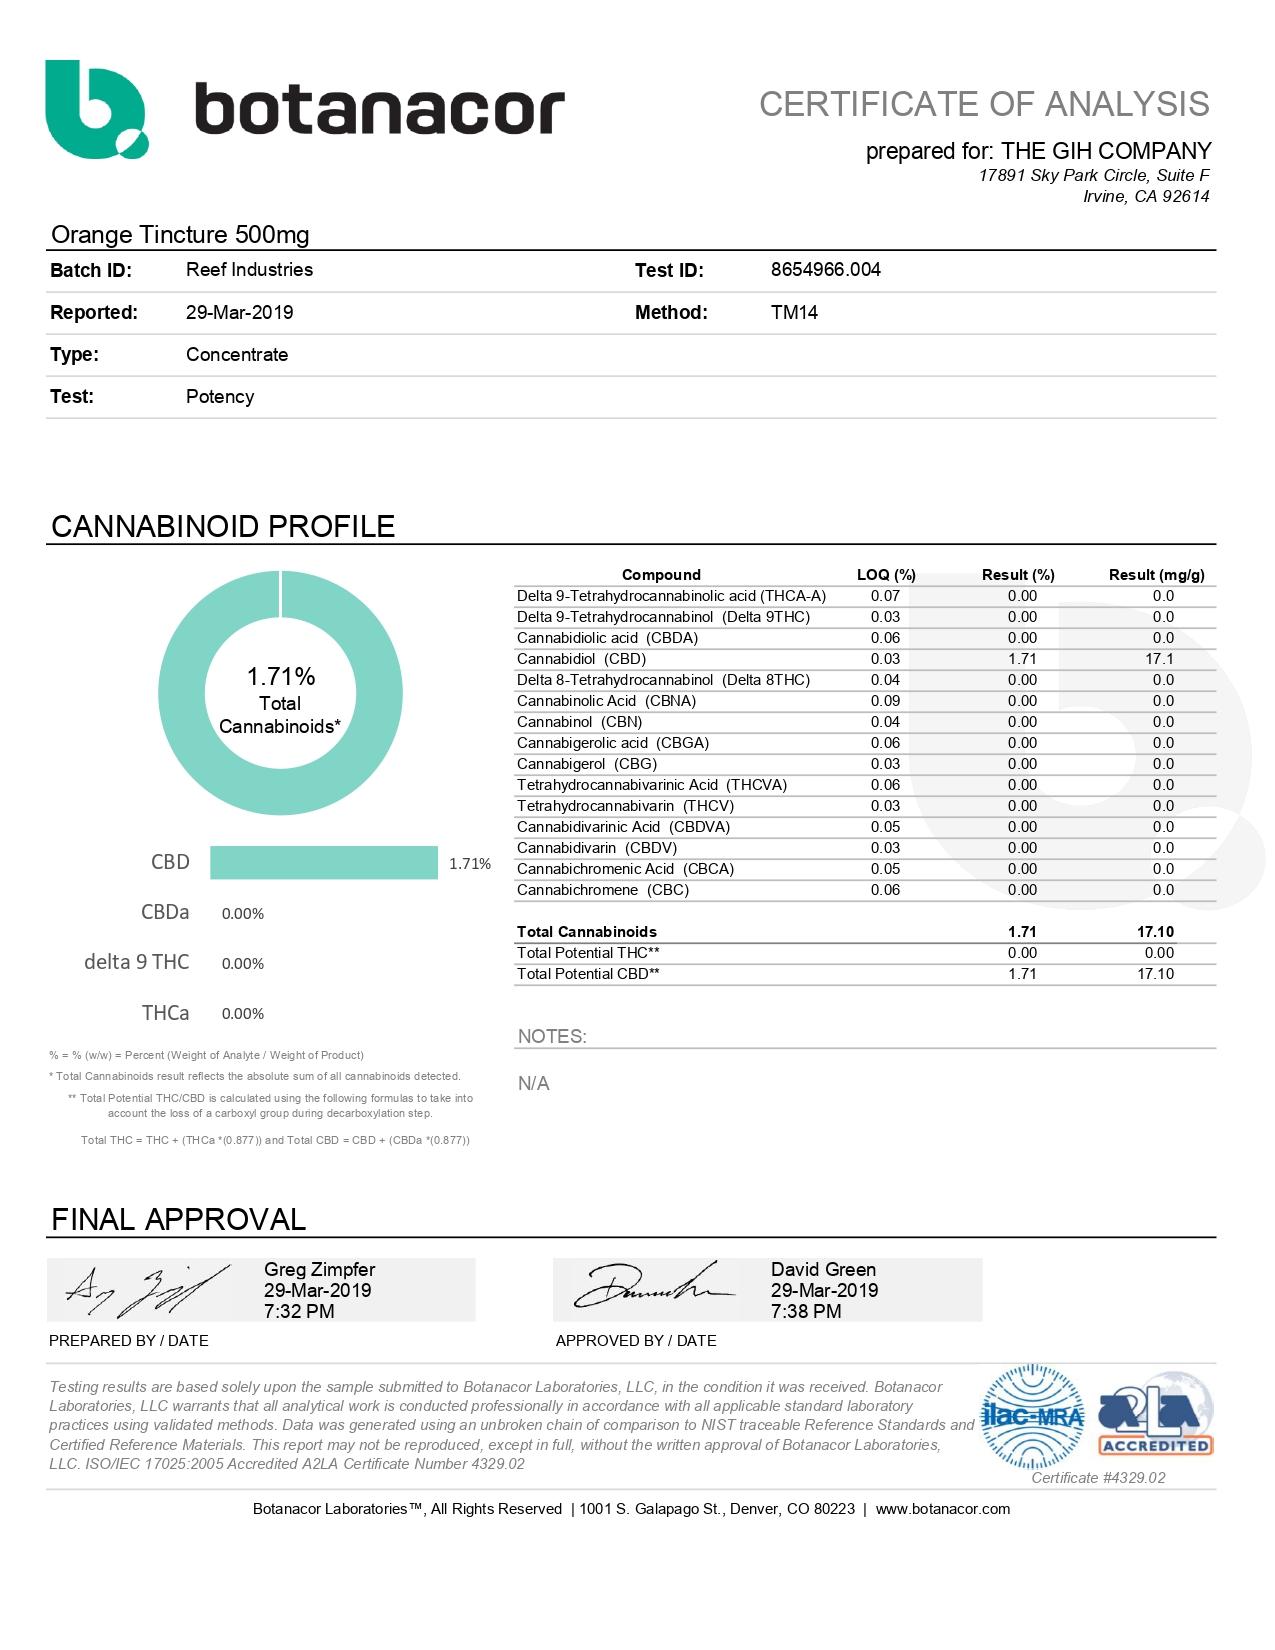 Reef CBD Tincture Newport Beach 500mg Lab Report